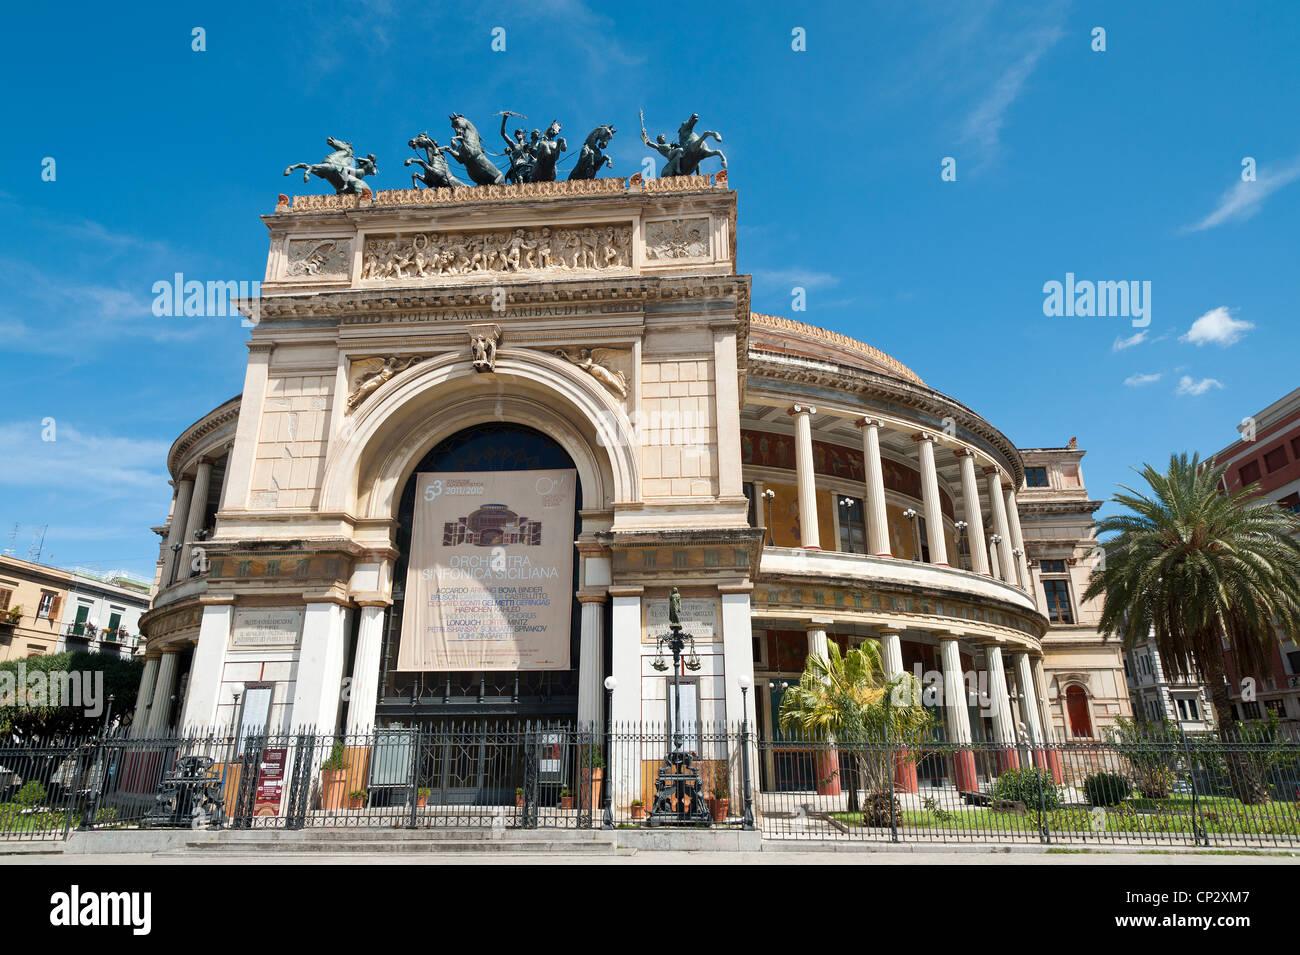 Palermo, Sicily, Italy - Teatro Politeama Garibaldi. Stock Photo